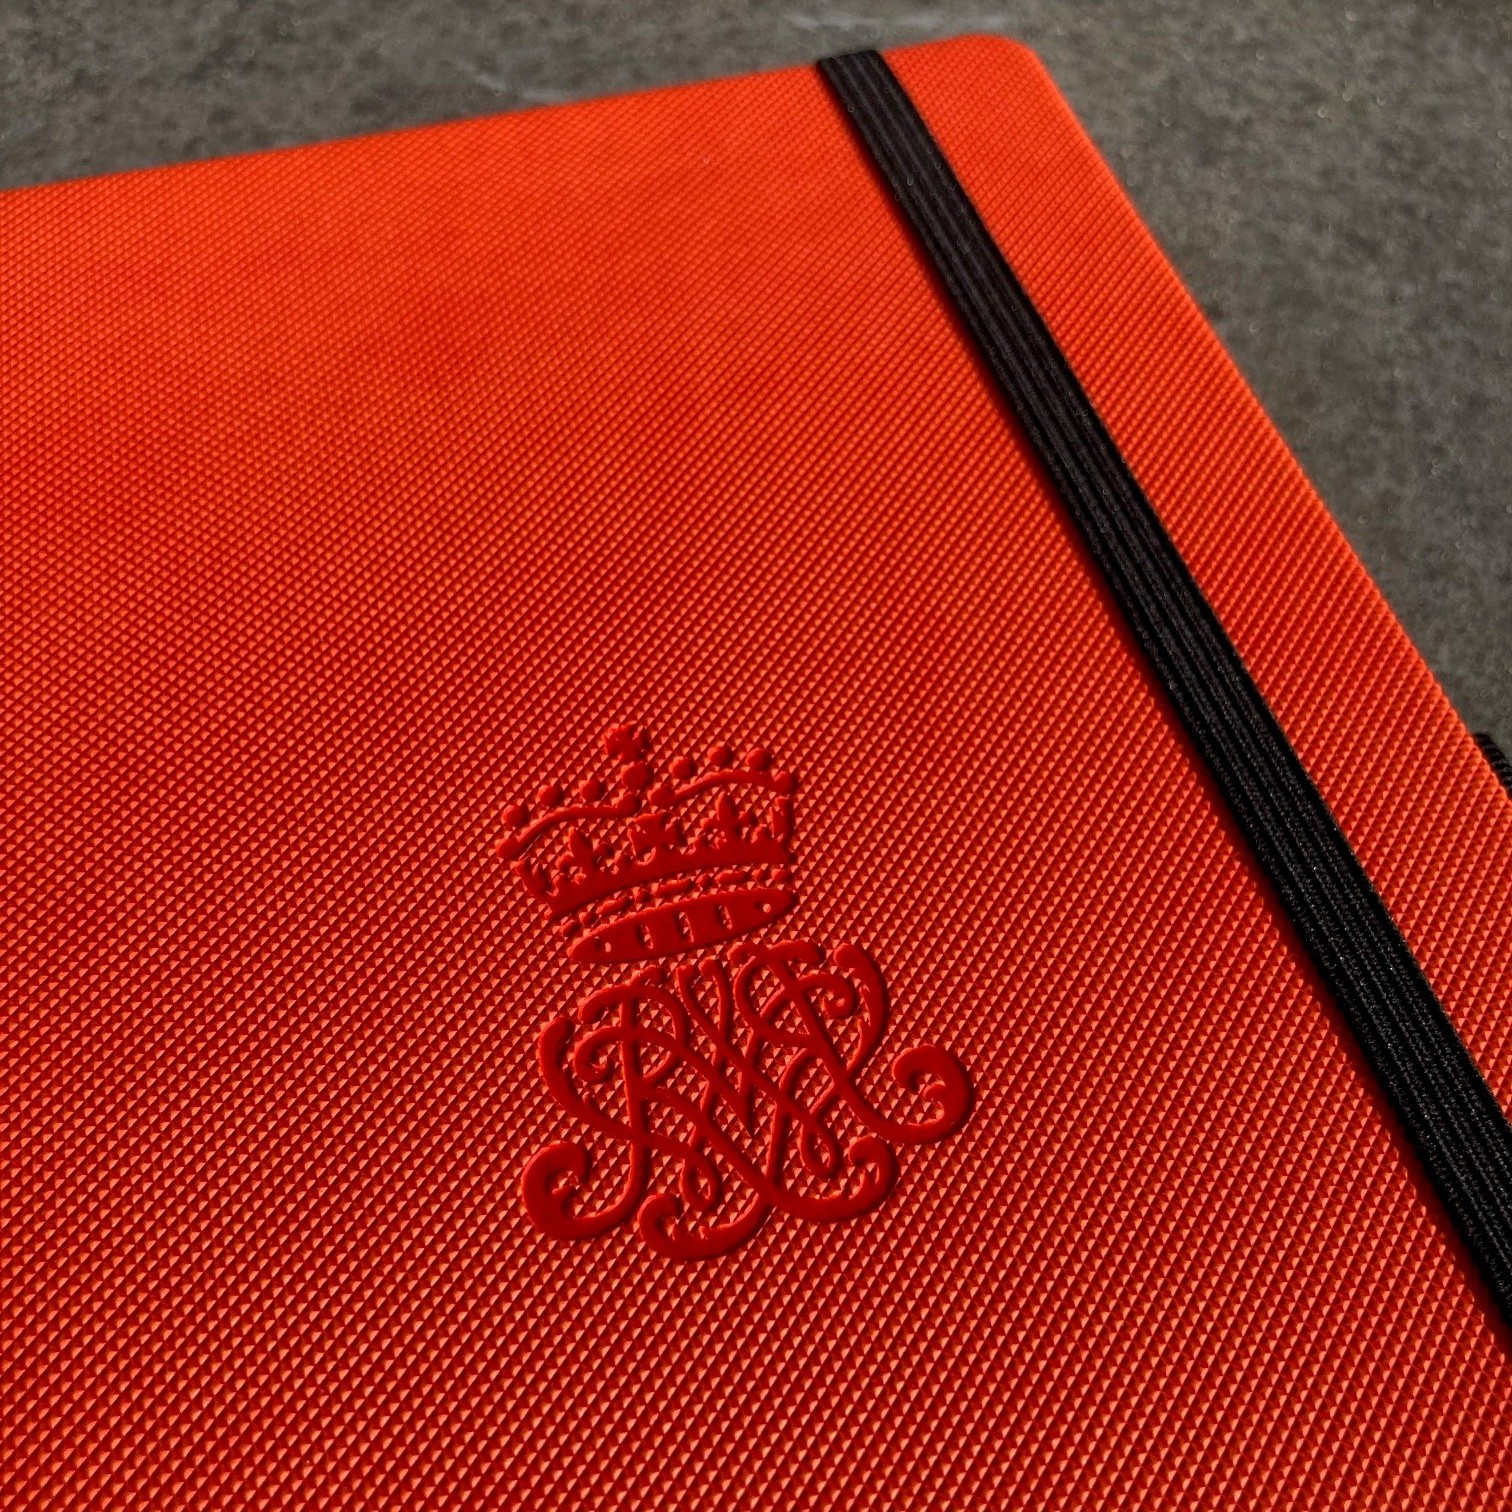 Mix&Match notitieboek Moderno Oranje met logo preeg